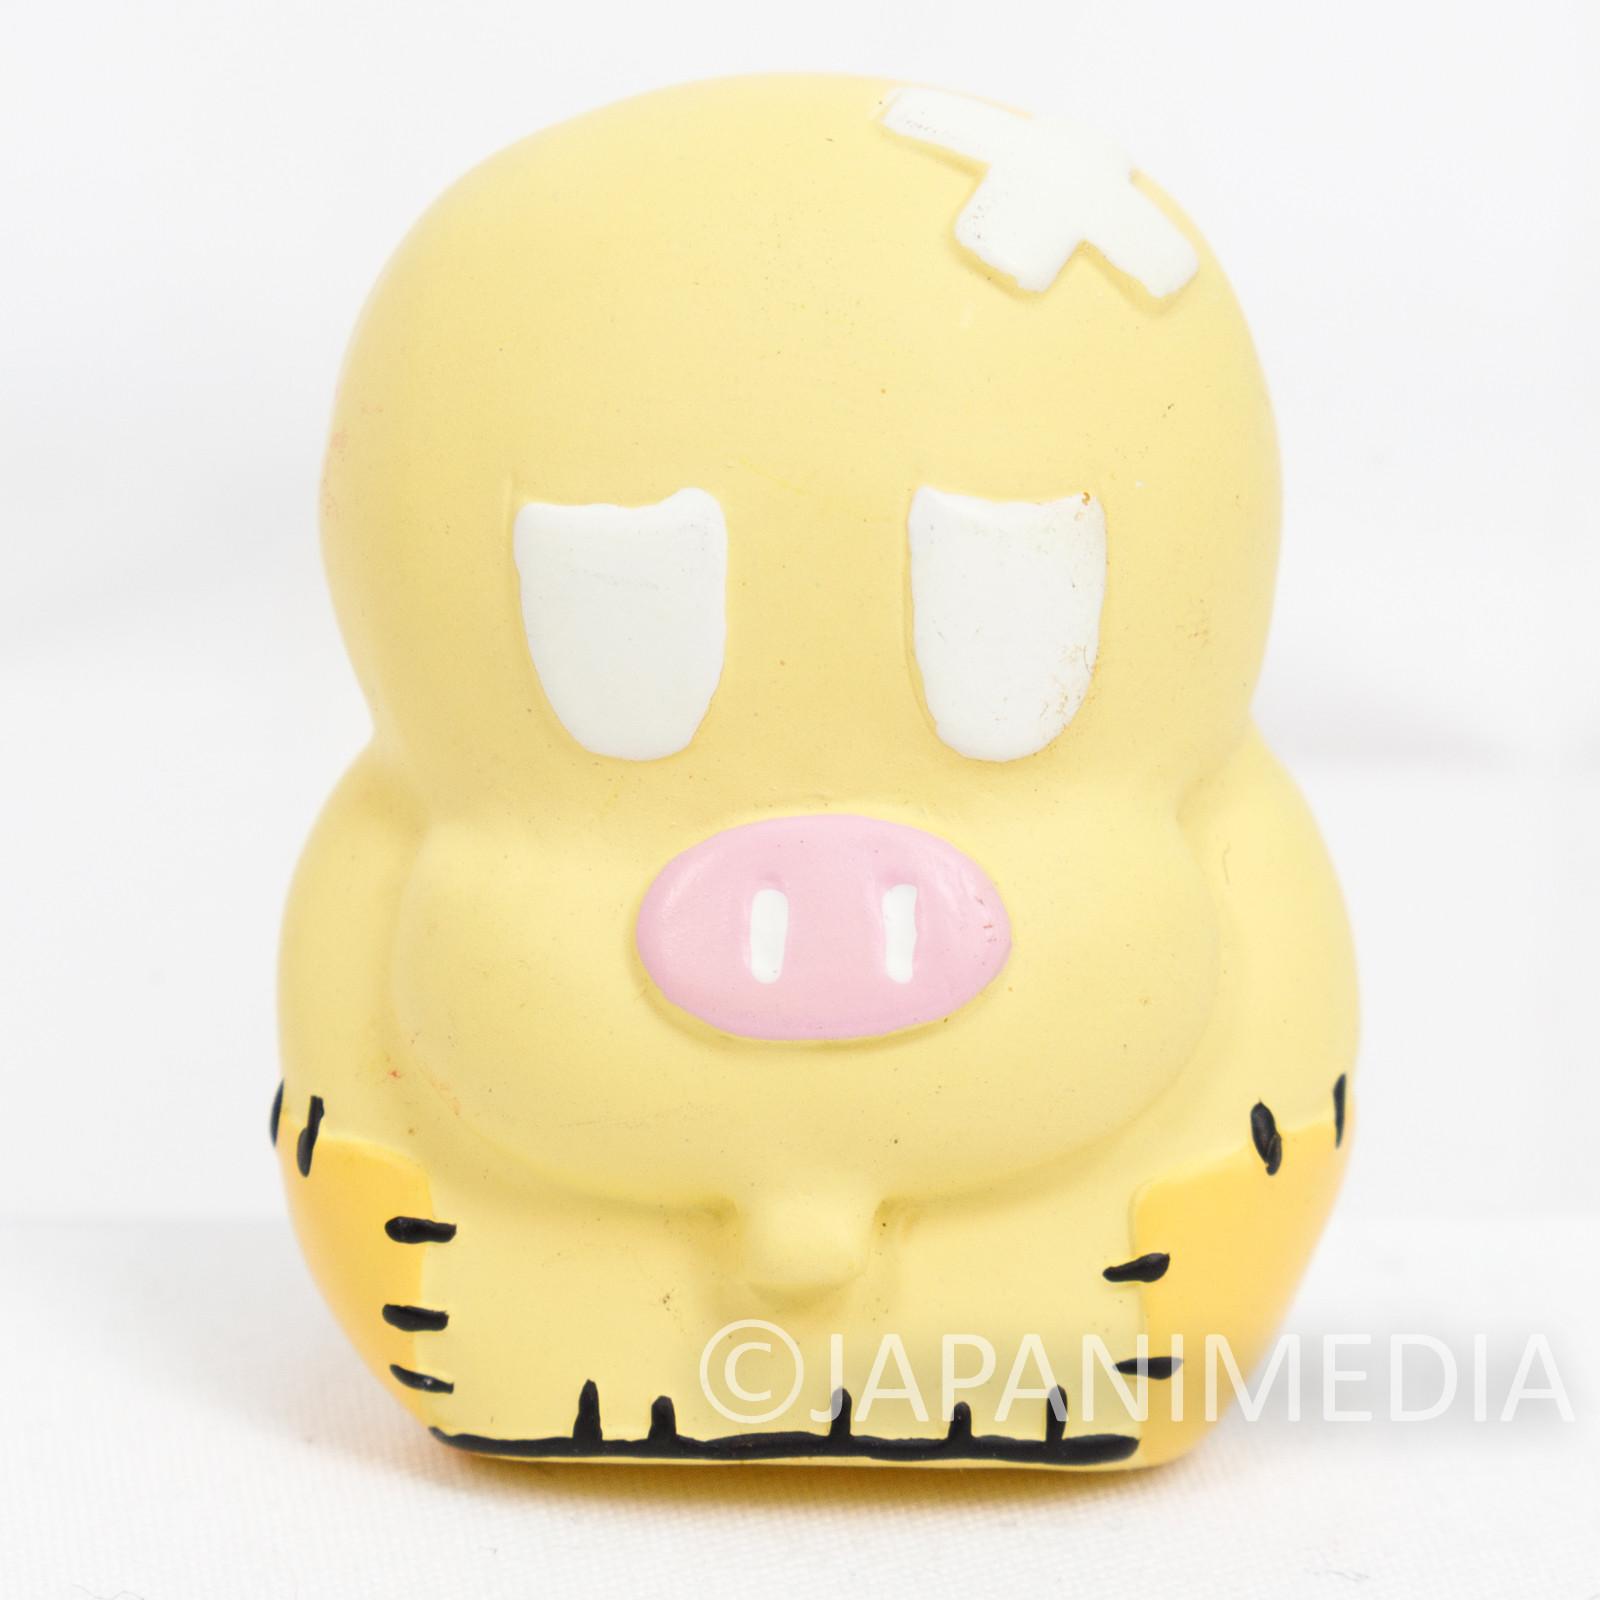 Retro RARE! Hyoutan-tsugi Mascot Figure Magnet Osamu Tezuka JAPAN ANIME